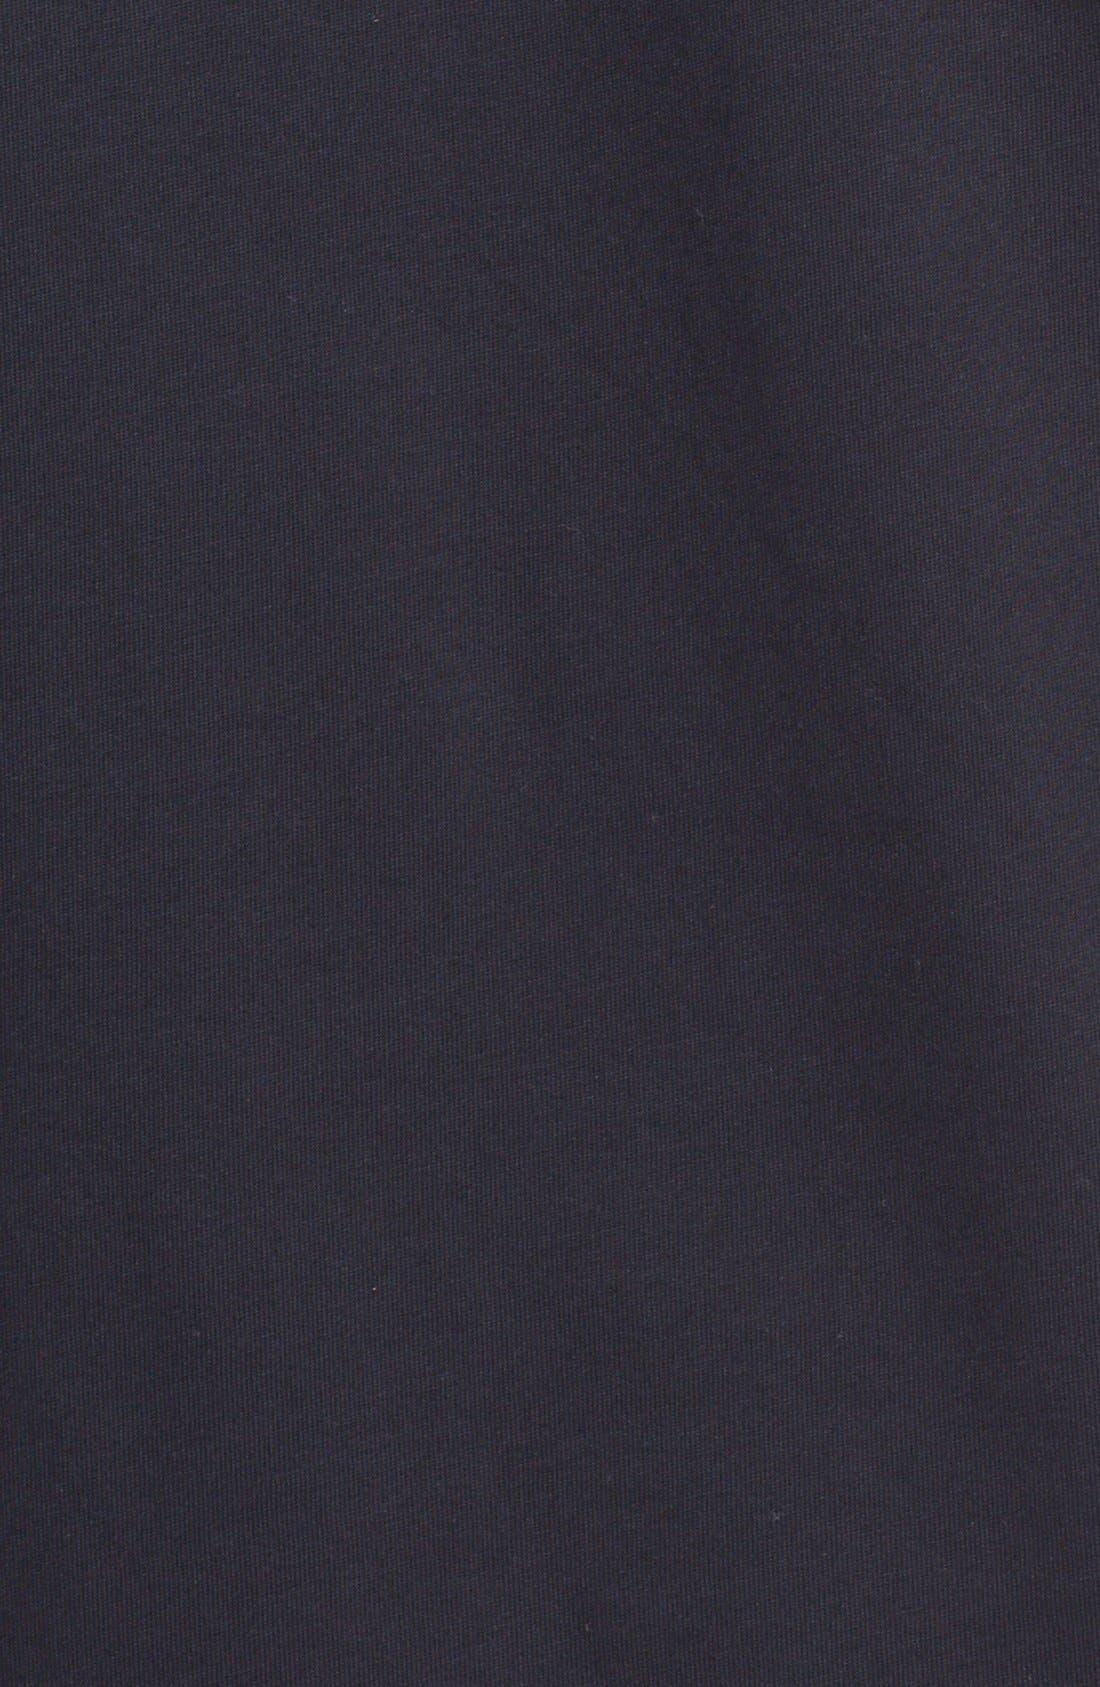 Paul Smith 'P.S. I Love You' Graphic Cotton T-Shirt,                             Alternate thumbnail 4, color,                             414